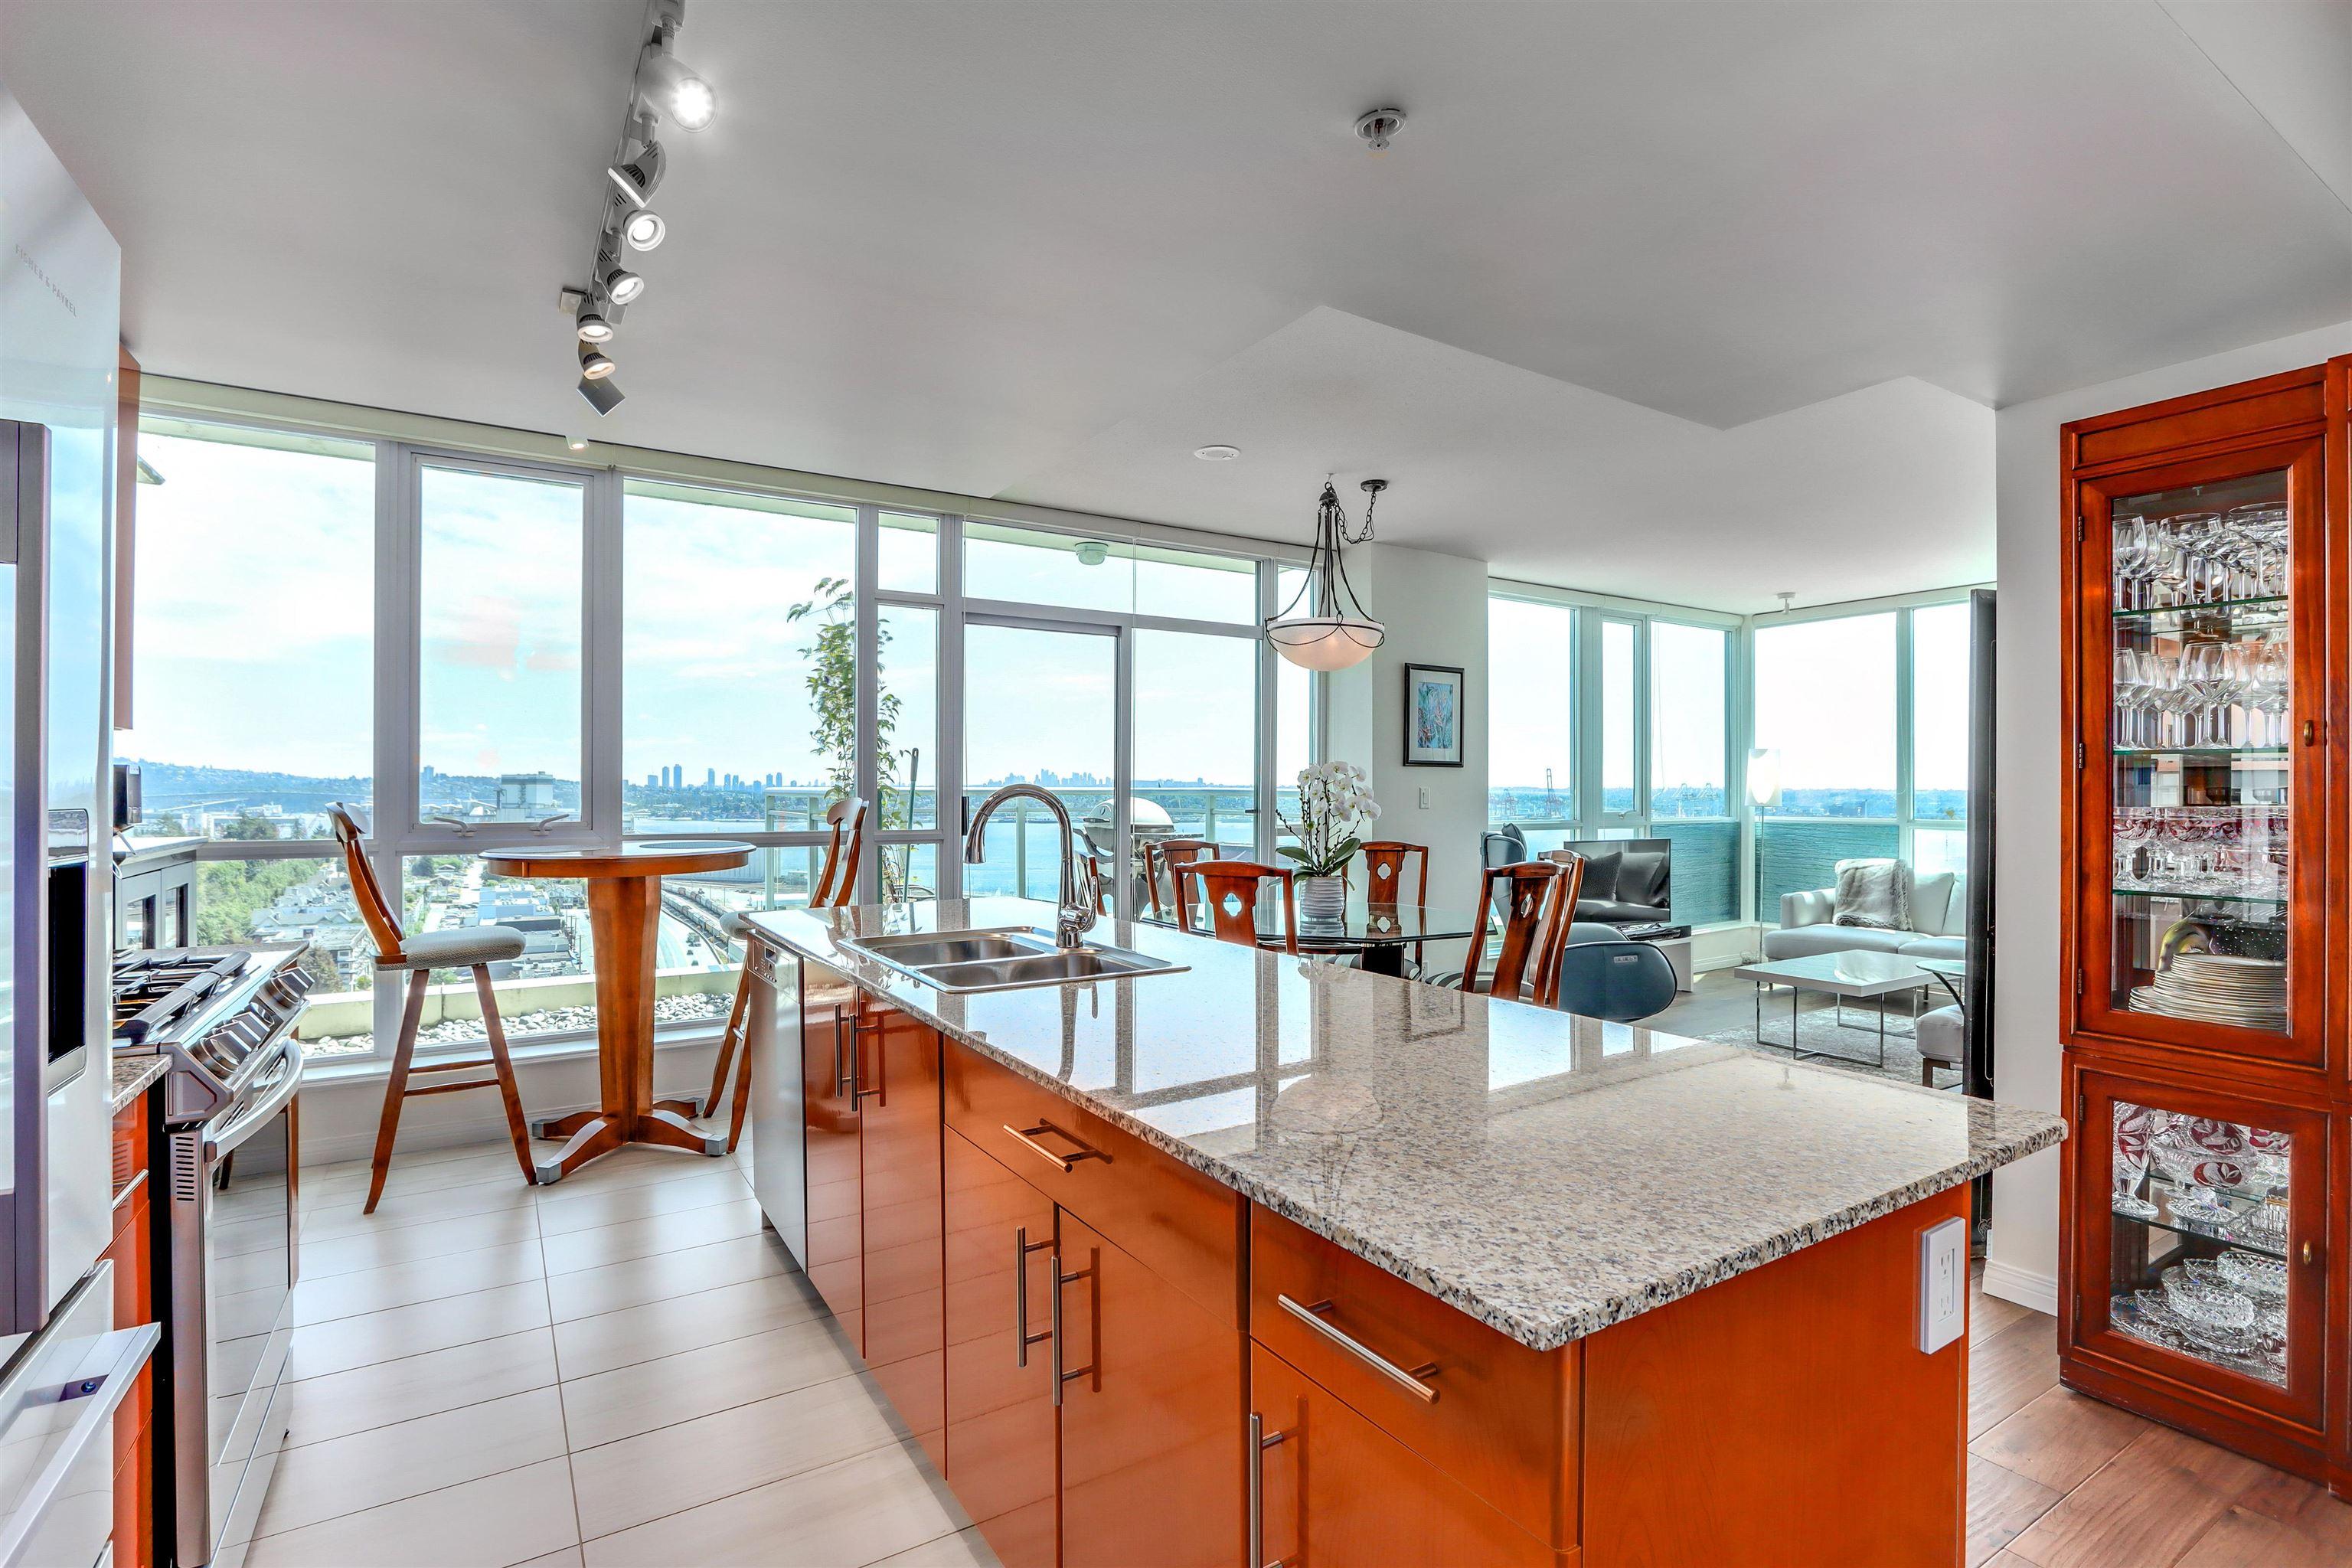 2202 188 E ESPLANADE - Lower Lonsdale Apartment/Condo for sale, 2 Bedrooms (R2618412) - #3